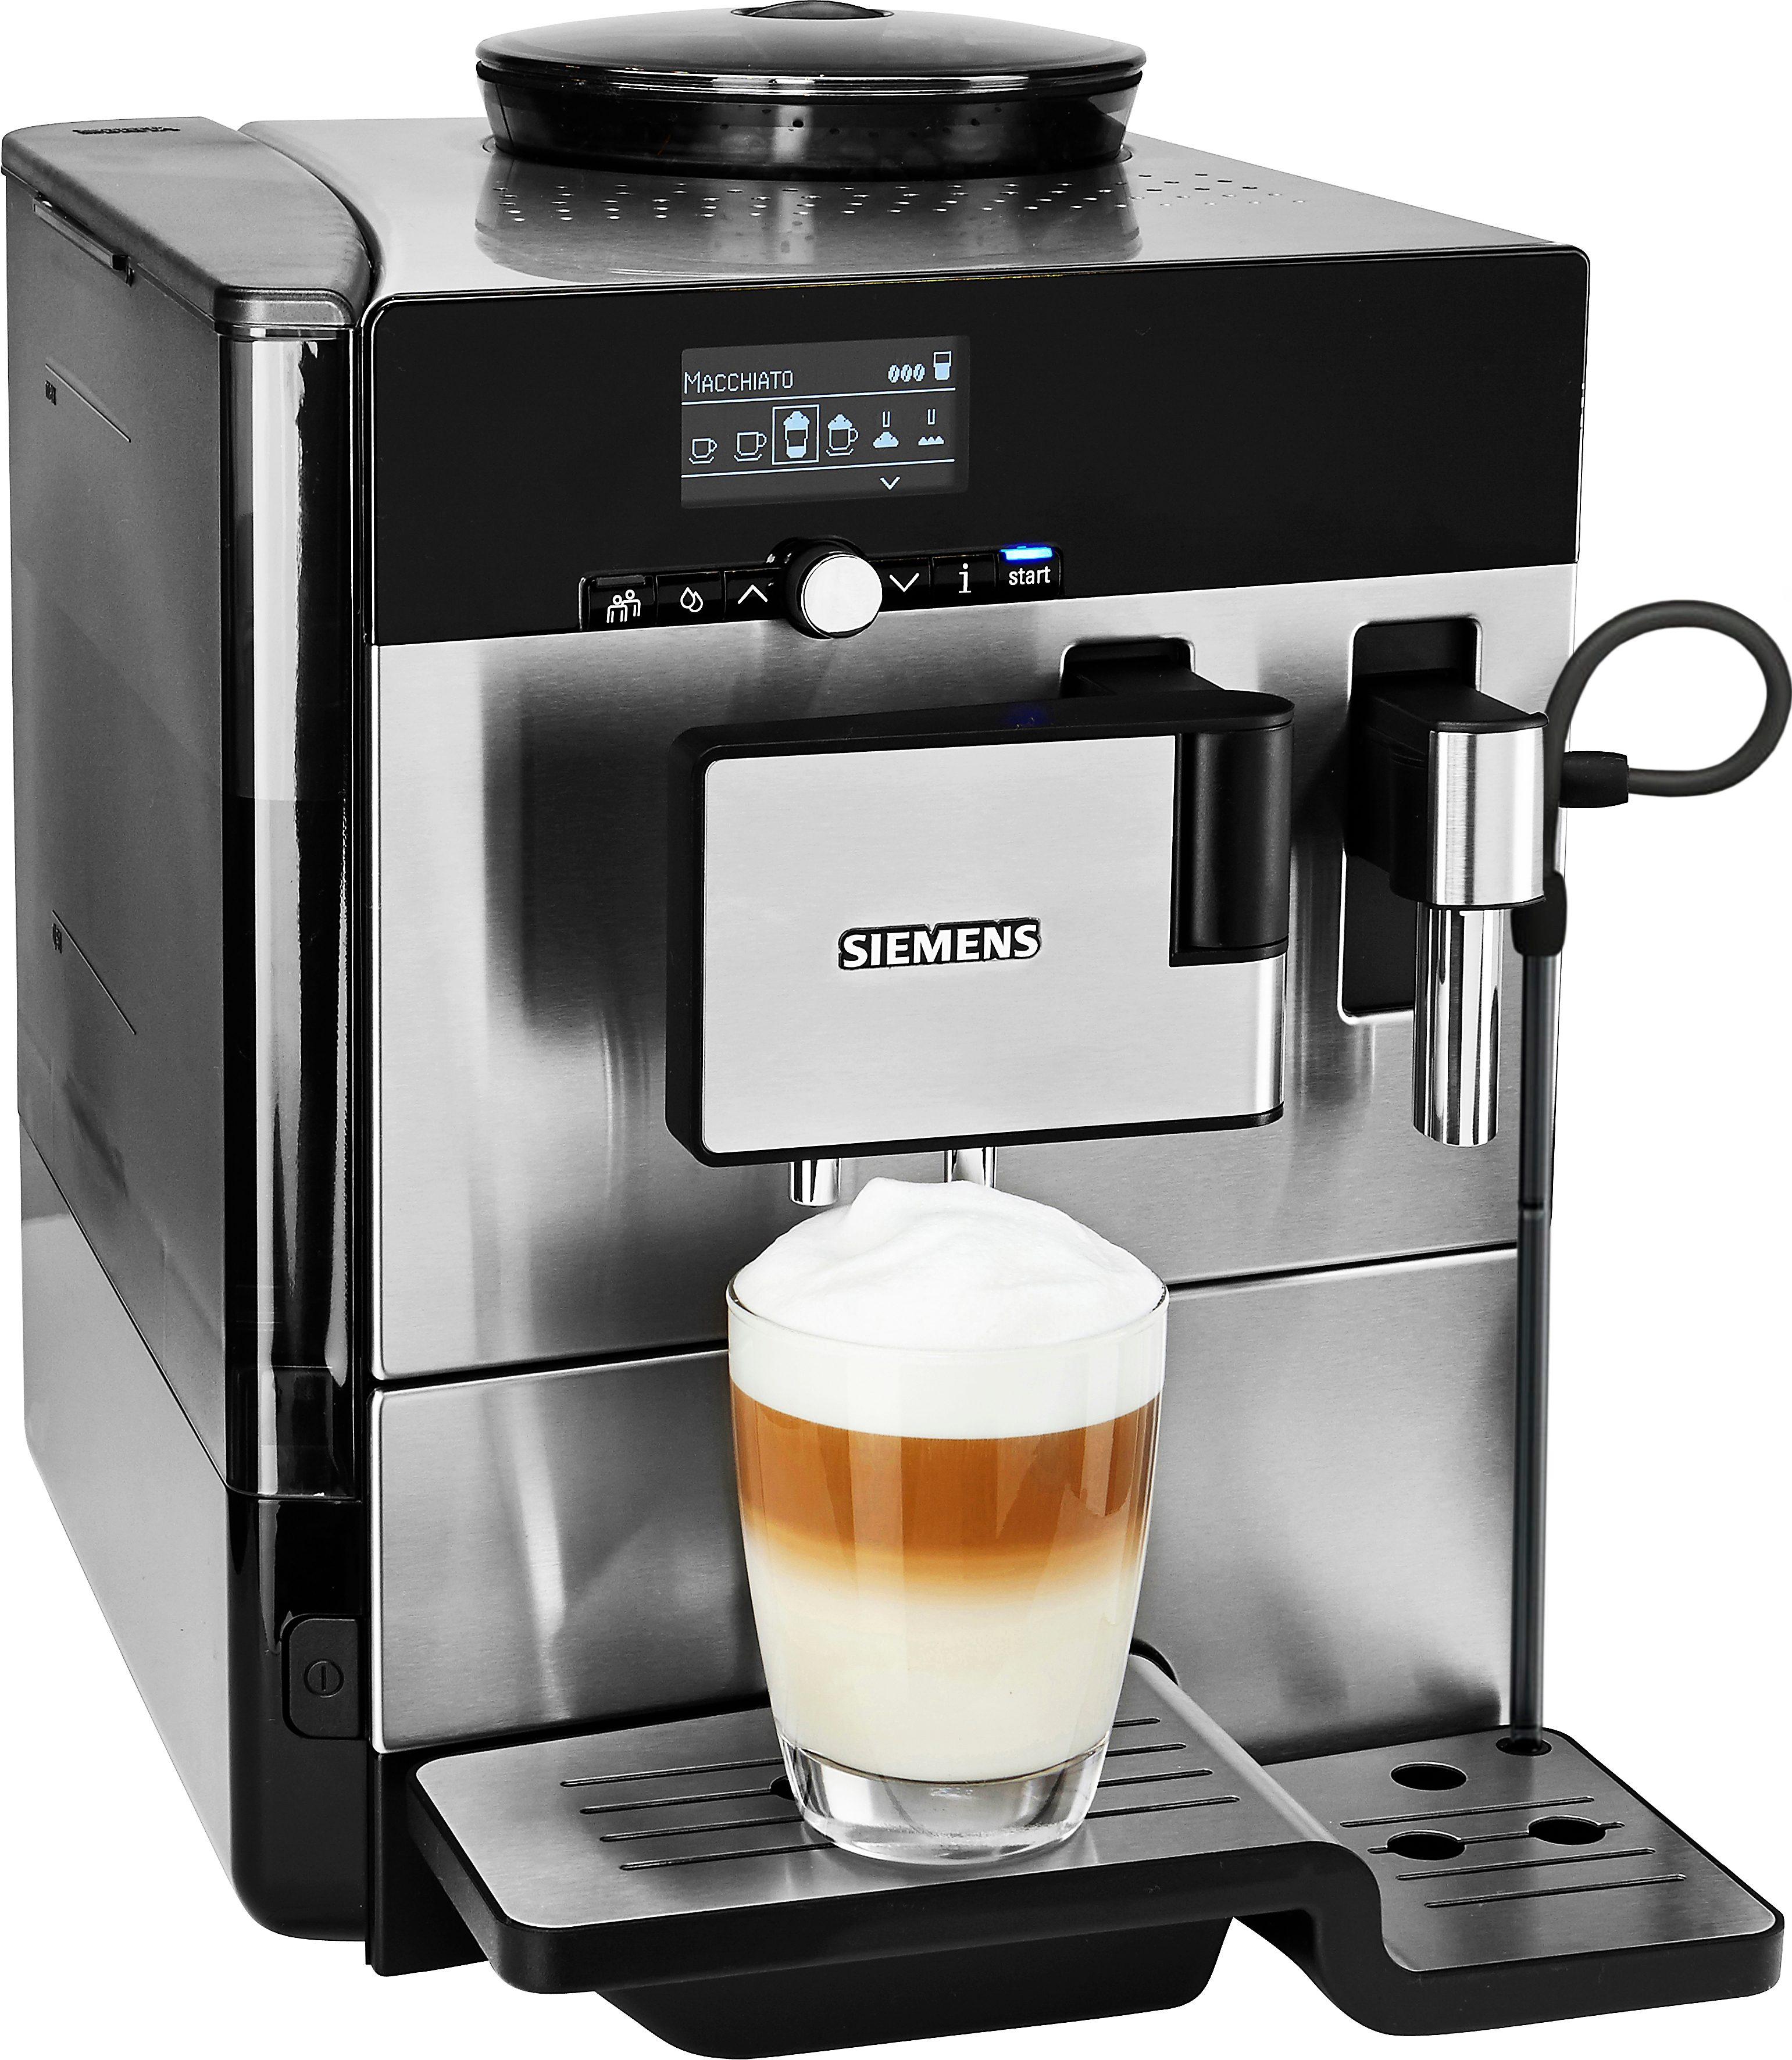 Siemens Kaffeevollautomat EQ.8 series 300 TE803509DE, Edelstahl / Hochglanz-schwarz